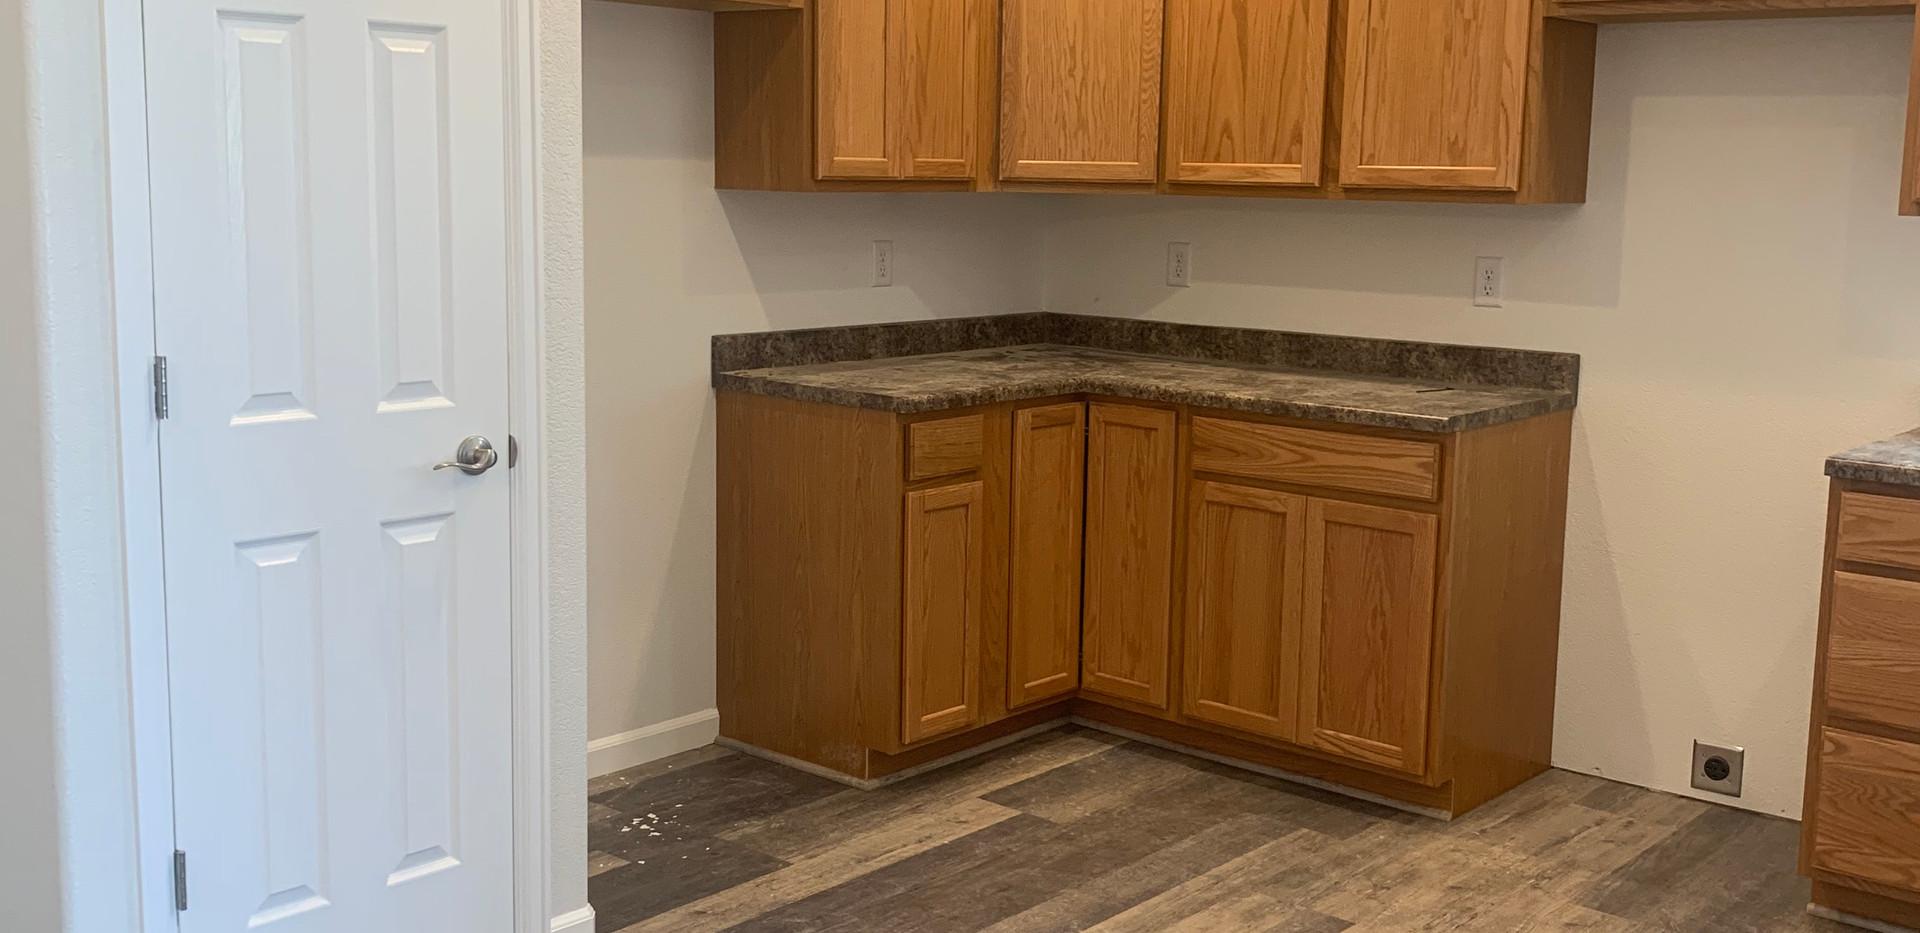 McNare kitchen3.jpg